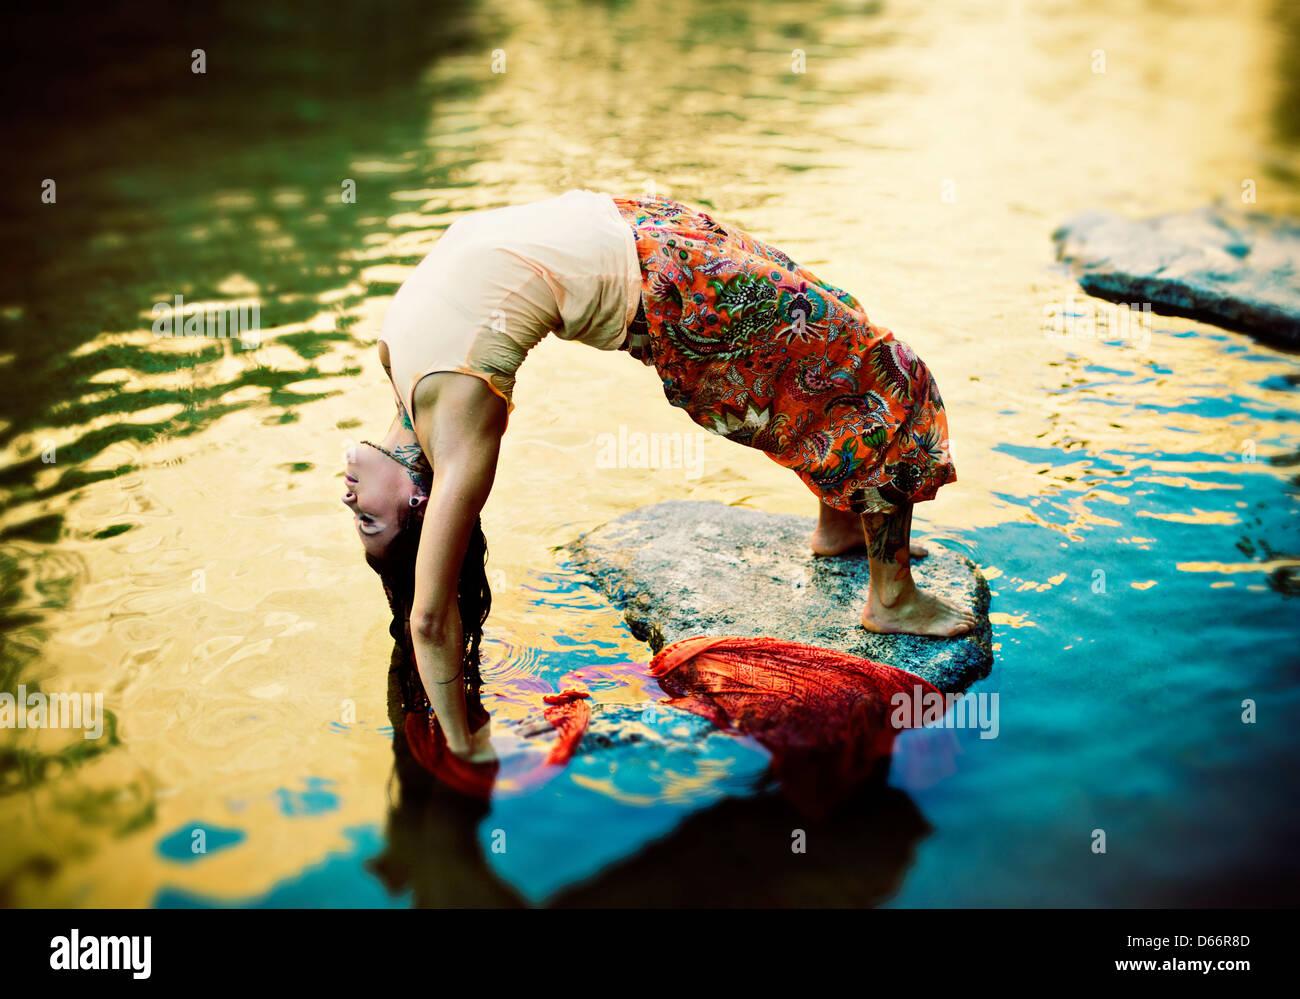 Yoga Woman outdoors in urdhva dhanurasana dans un étang. Photo Stock